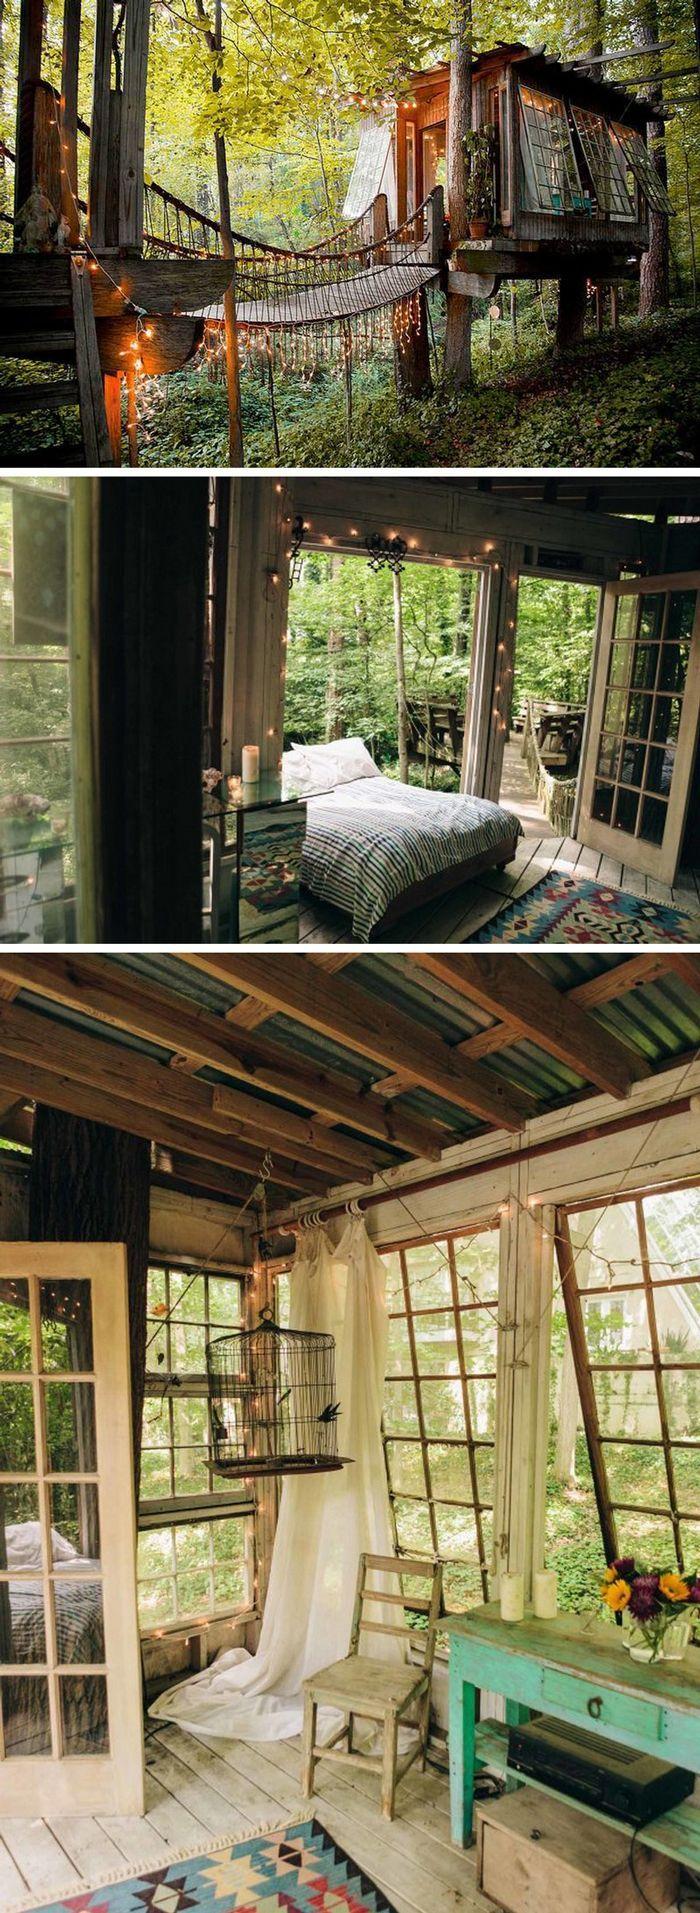 Best 25 Treehouse Ideas Ideas On Pinterest Treehouses